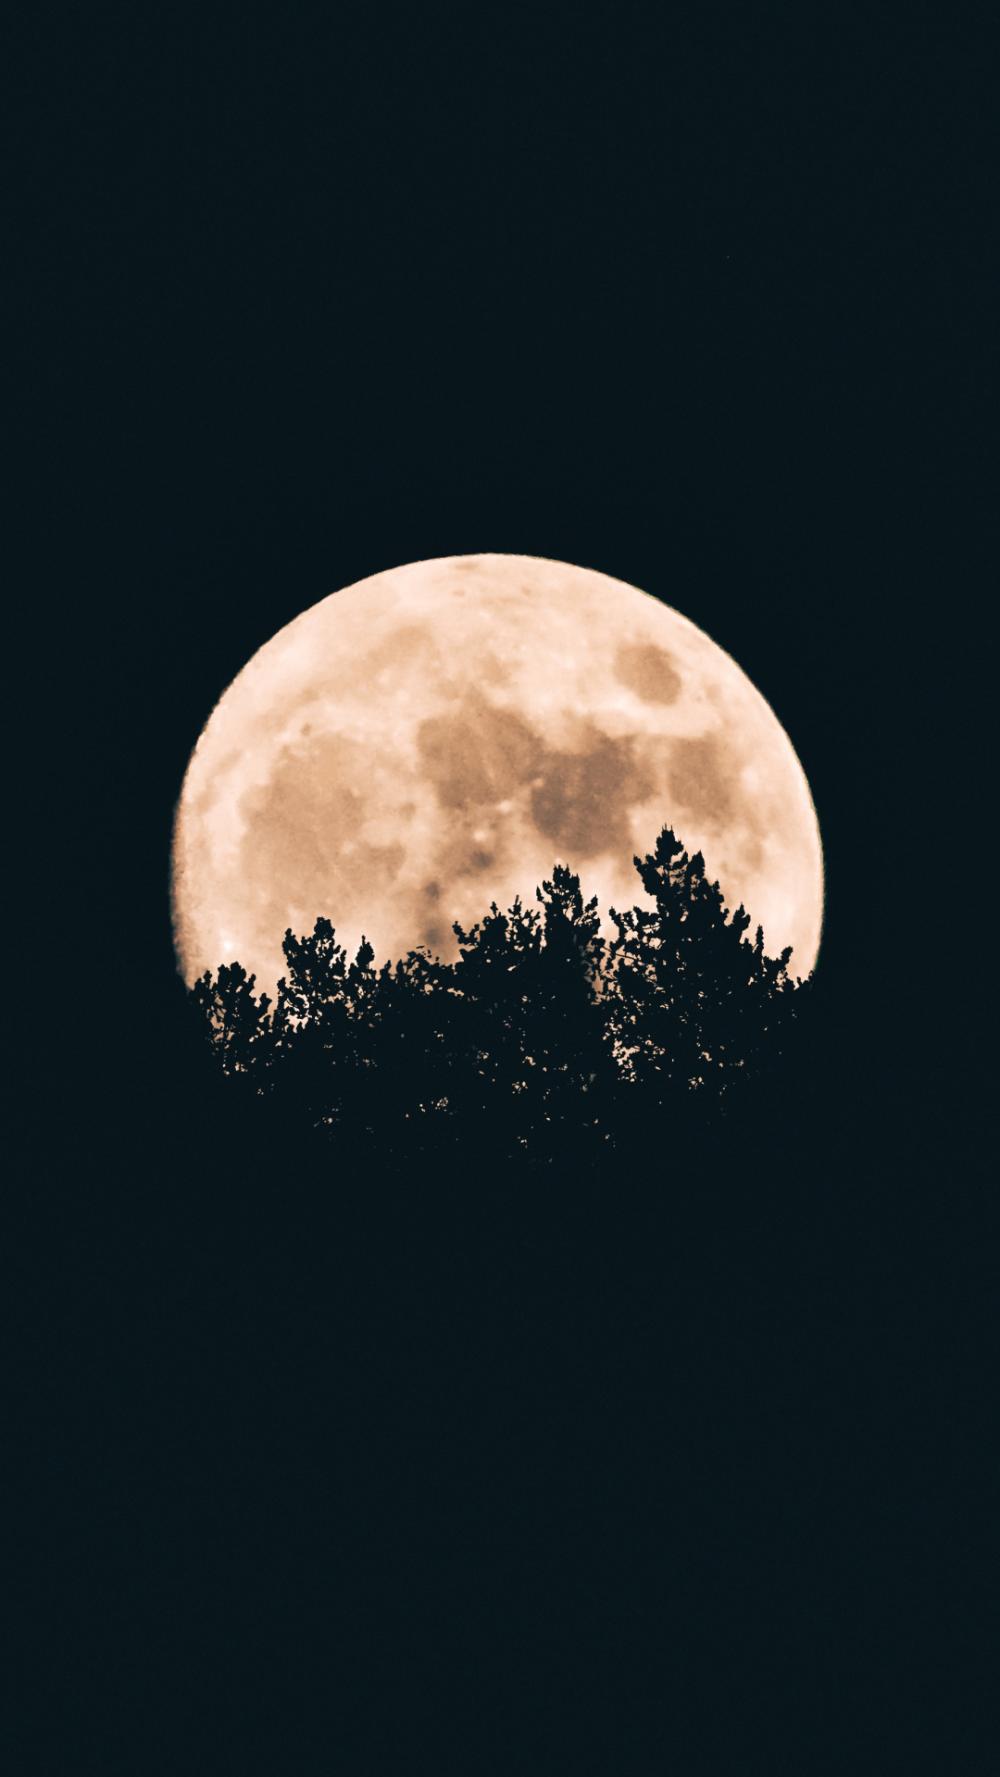 bf4111b71c8af5291b6f1236fec9e933 - How To Get Rid Of Moon On Iphone 7